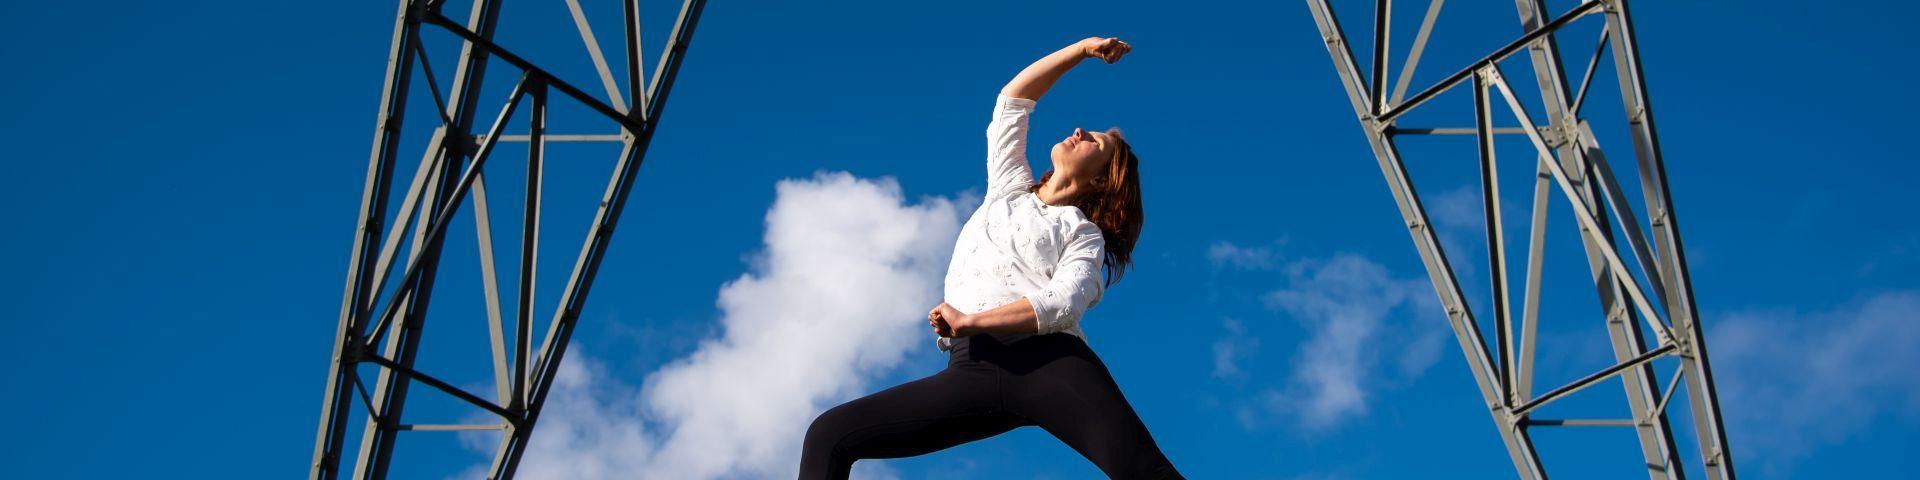 Poweryoga - Banner_Leefstijlcoach-Wageningen-Ede-Bennekom-yoga-coaching-personal-training_DSC_3779